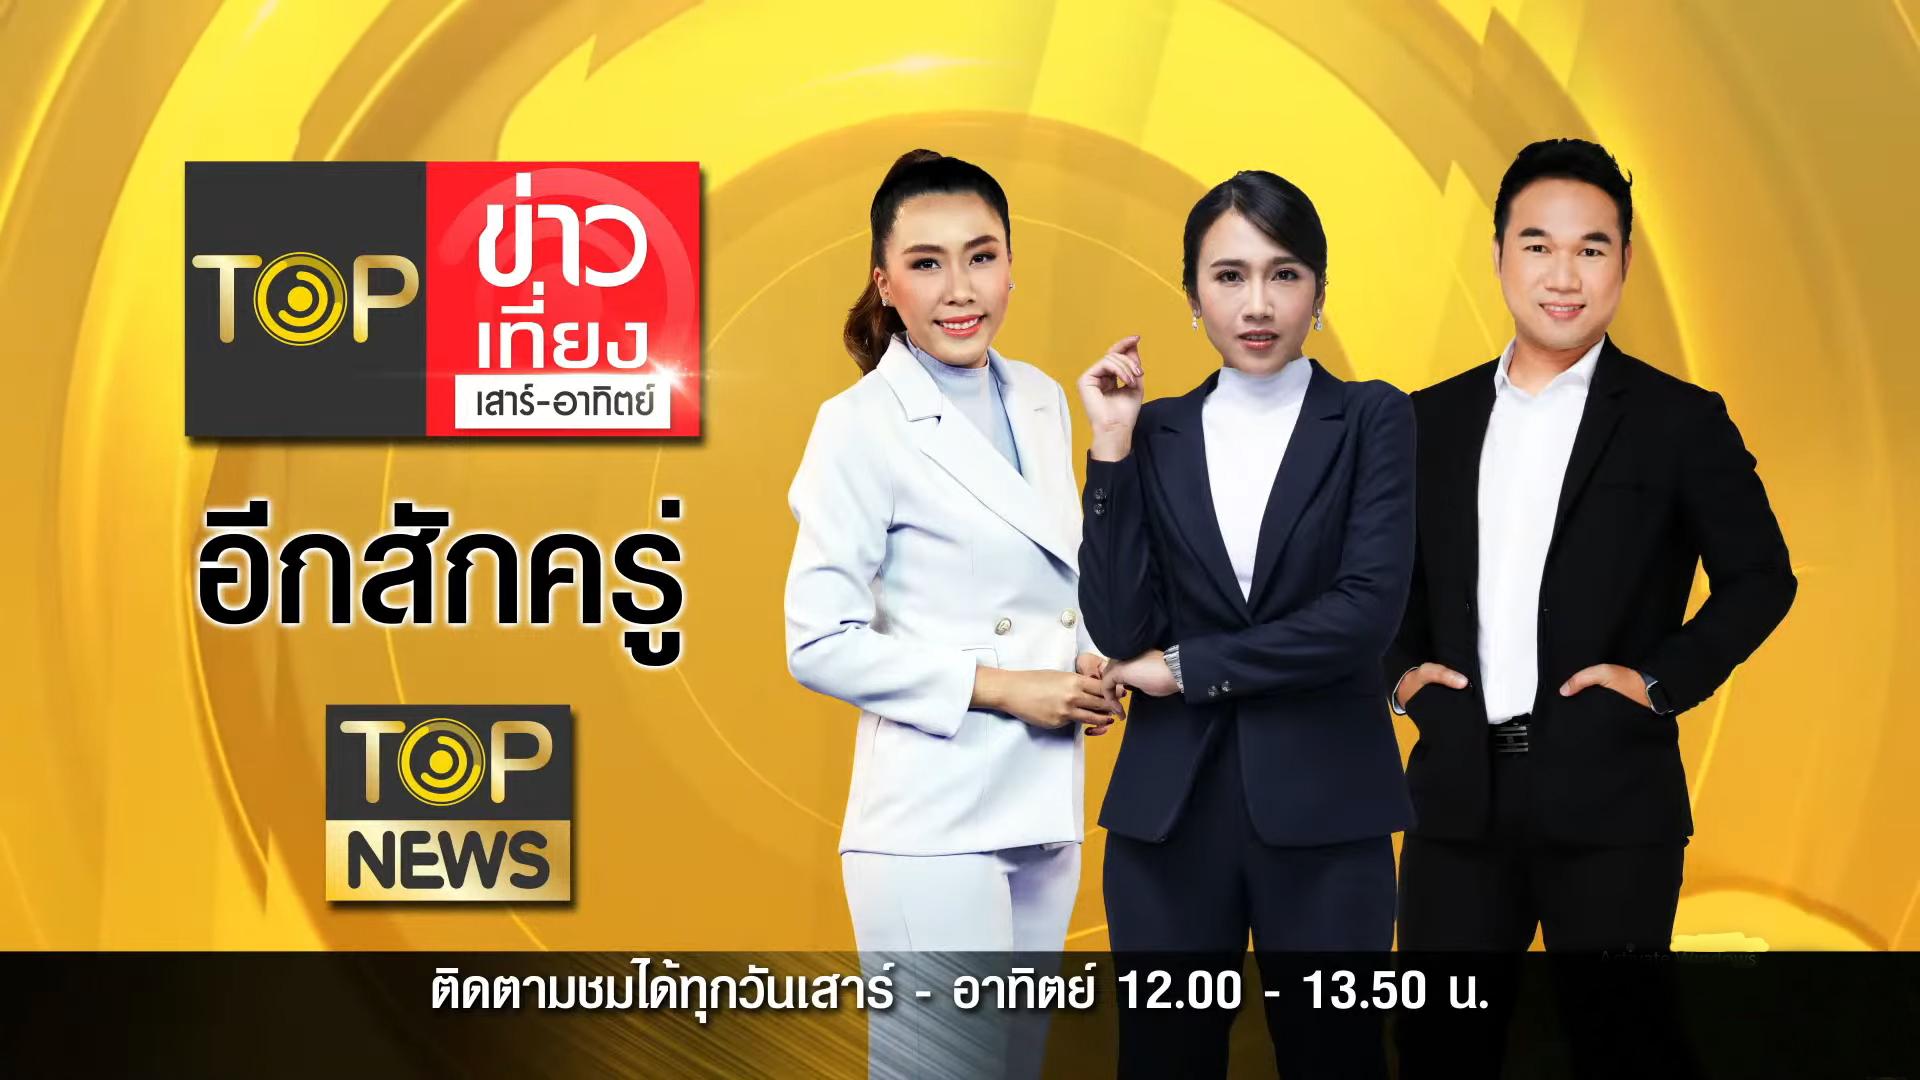 TOP ข่าวเที่ยง เสาร์ – อาทิตย์ | 20 มิถุนายน 2564